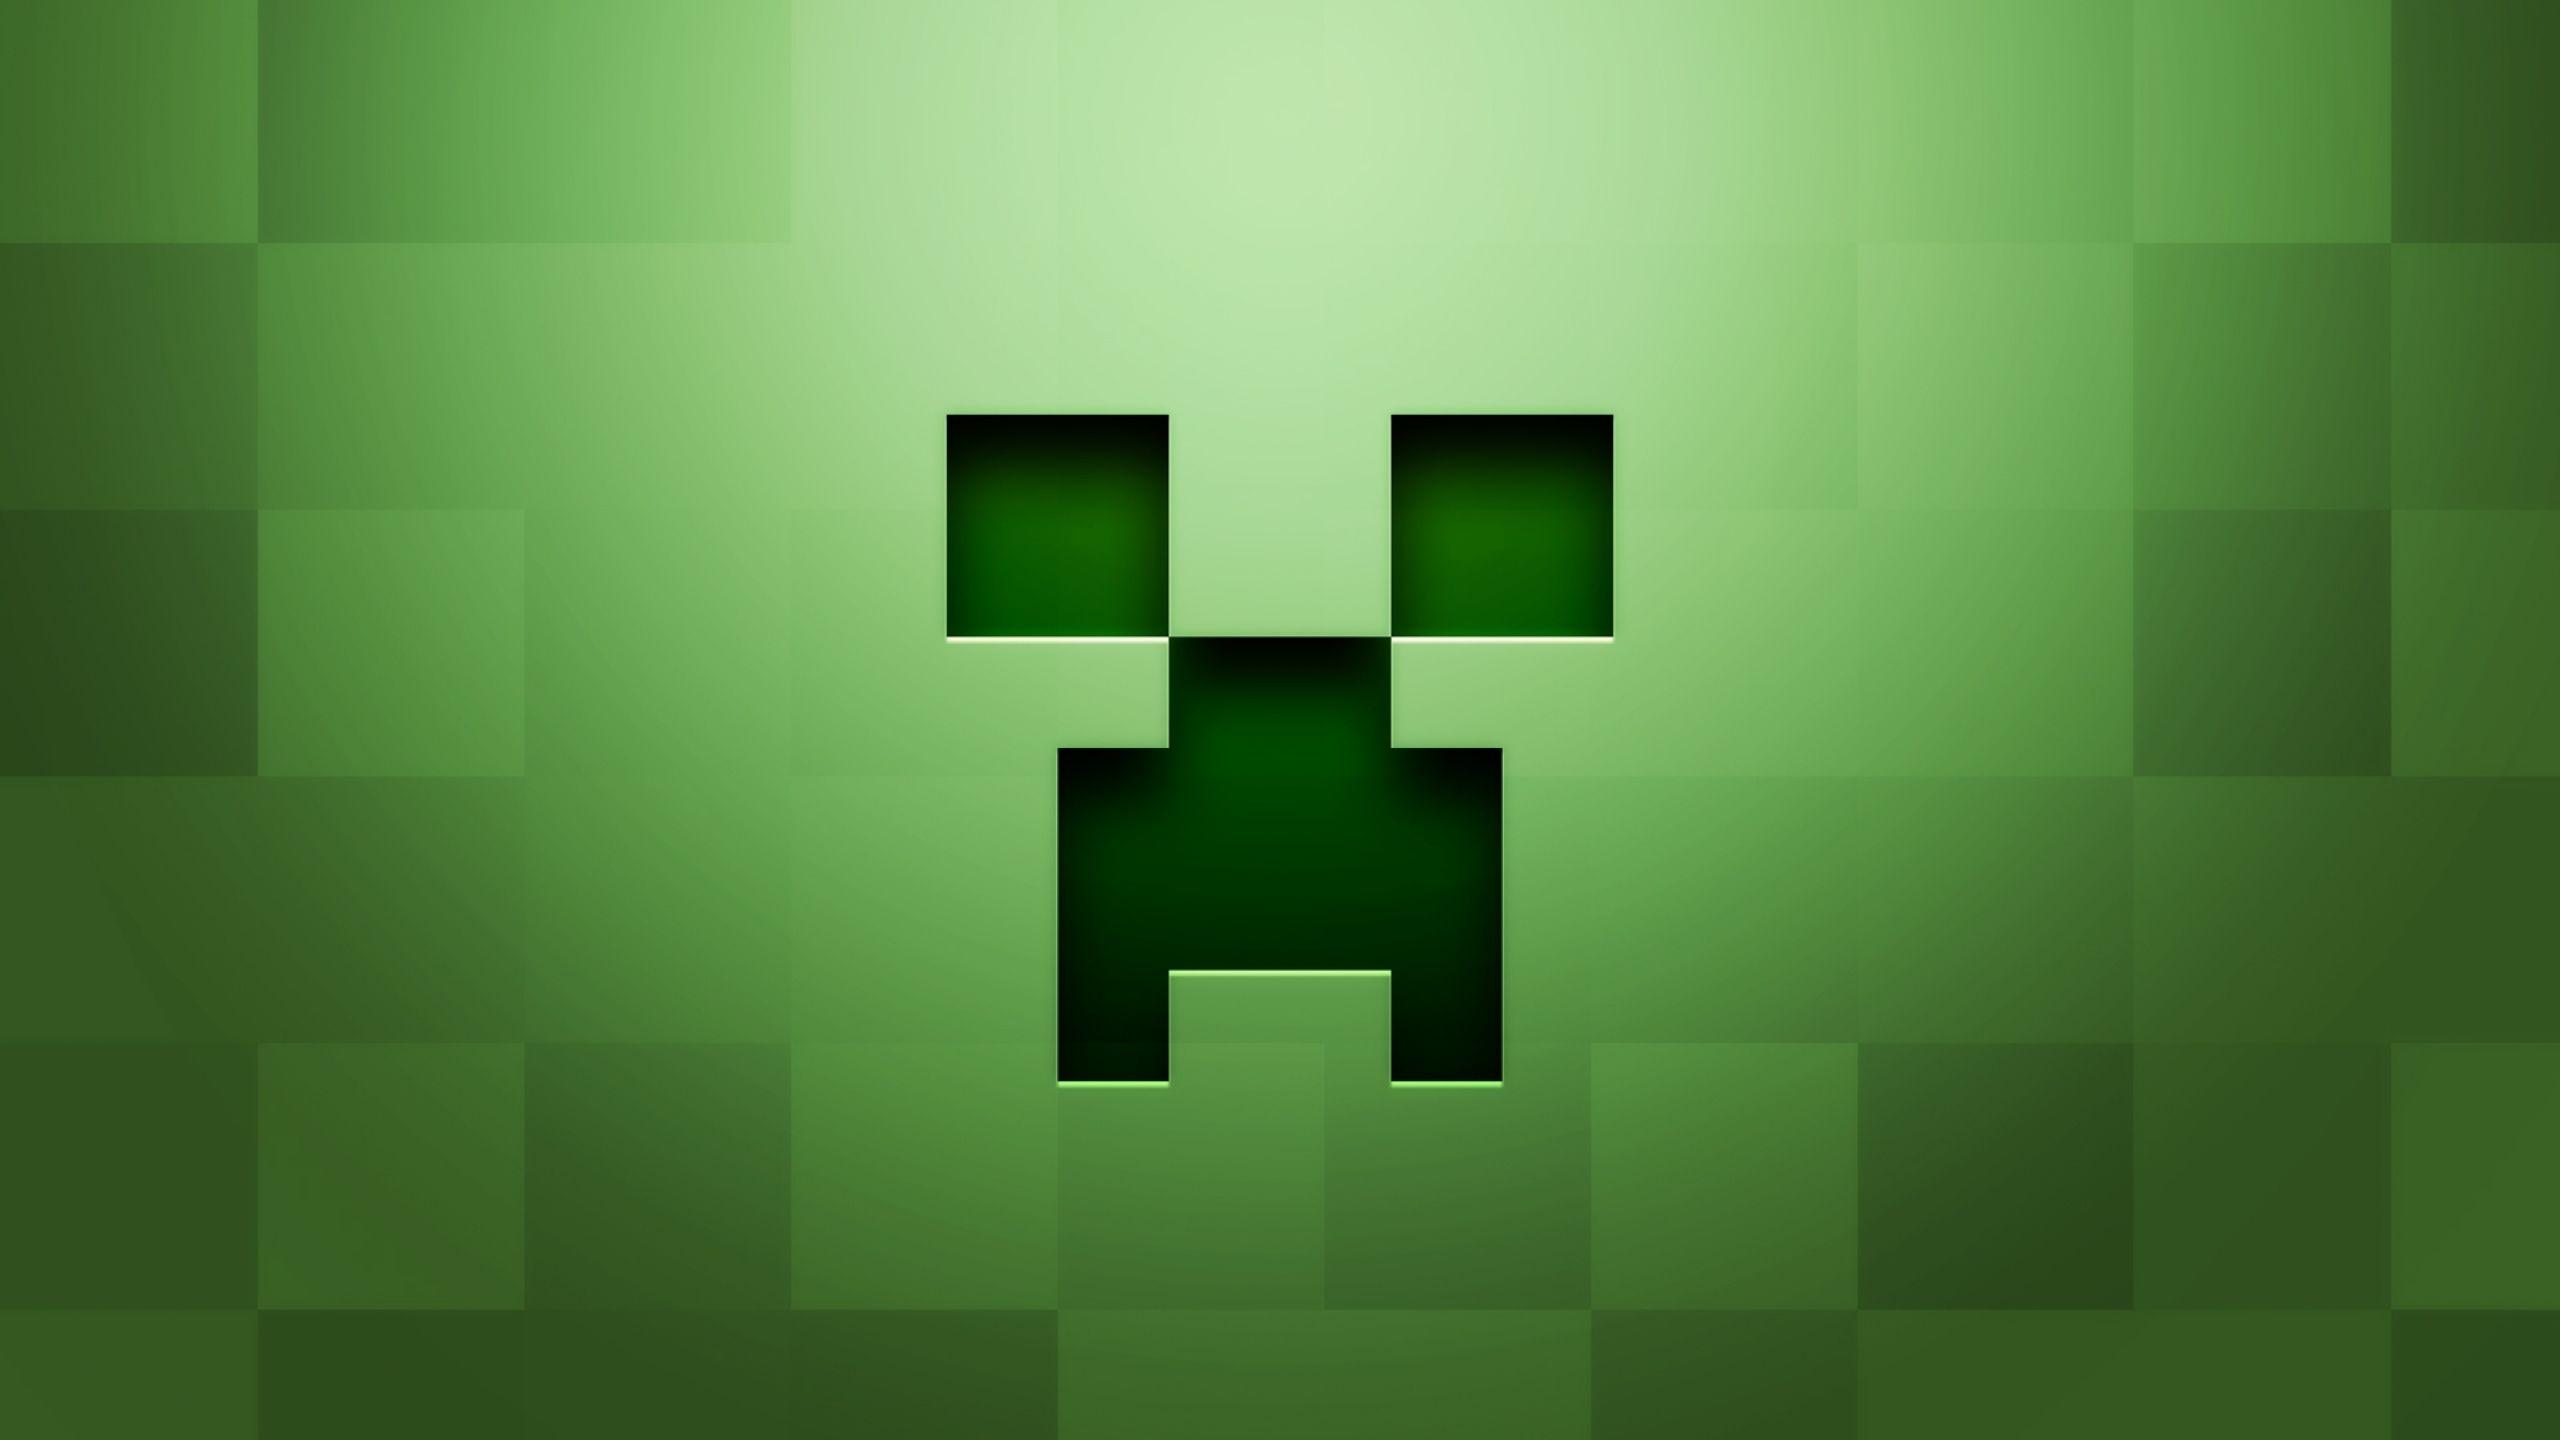 Download Wallpaper 2560x1440 Minecraft Background Graphics